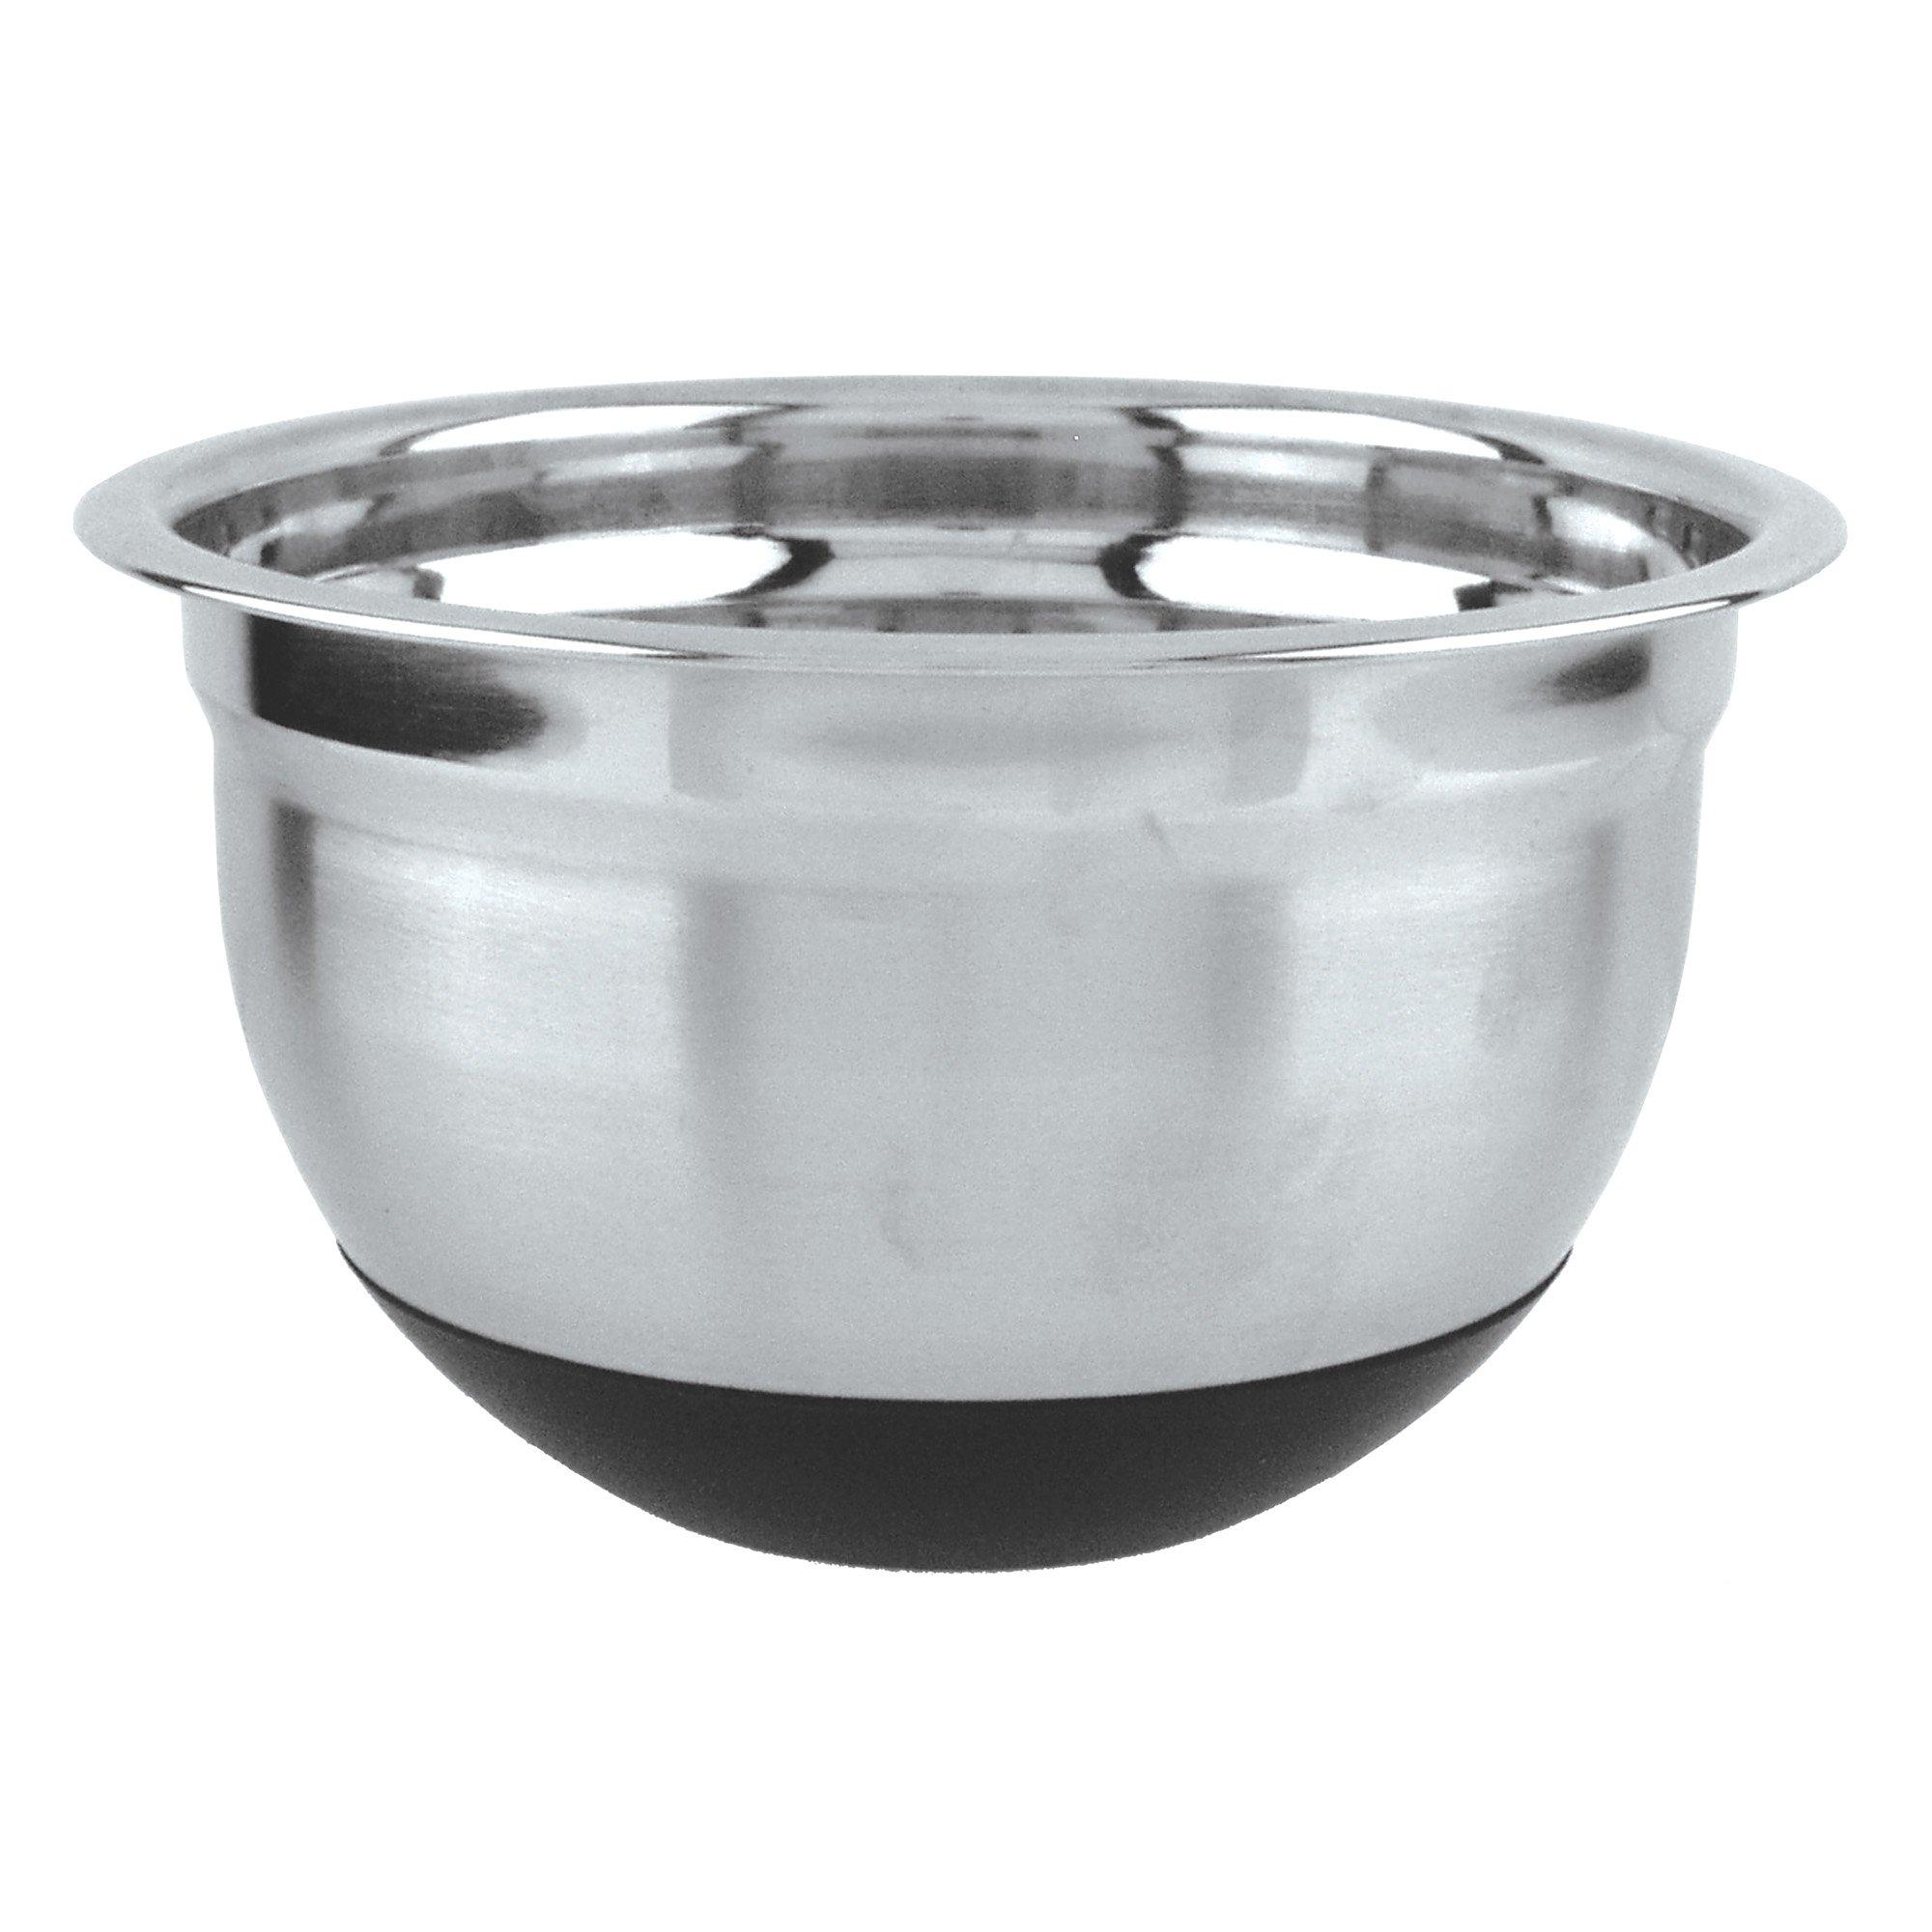 Fox Run 36427 Non-Skid Mixing Bowl, Stainless Steel, 5-Quart